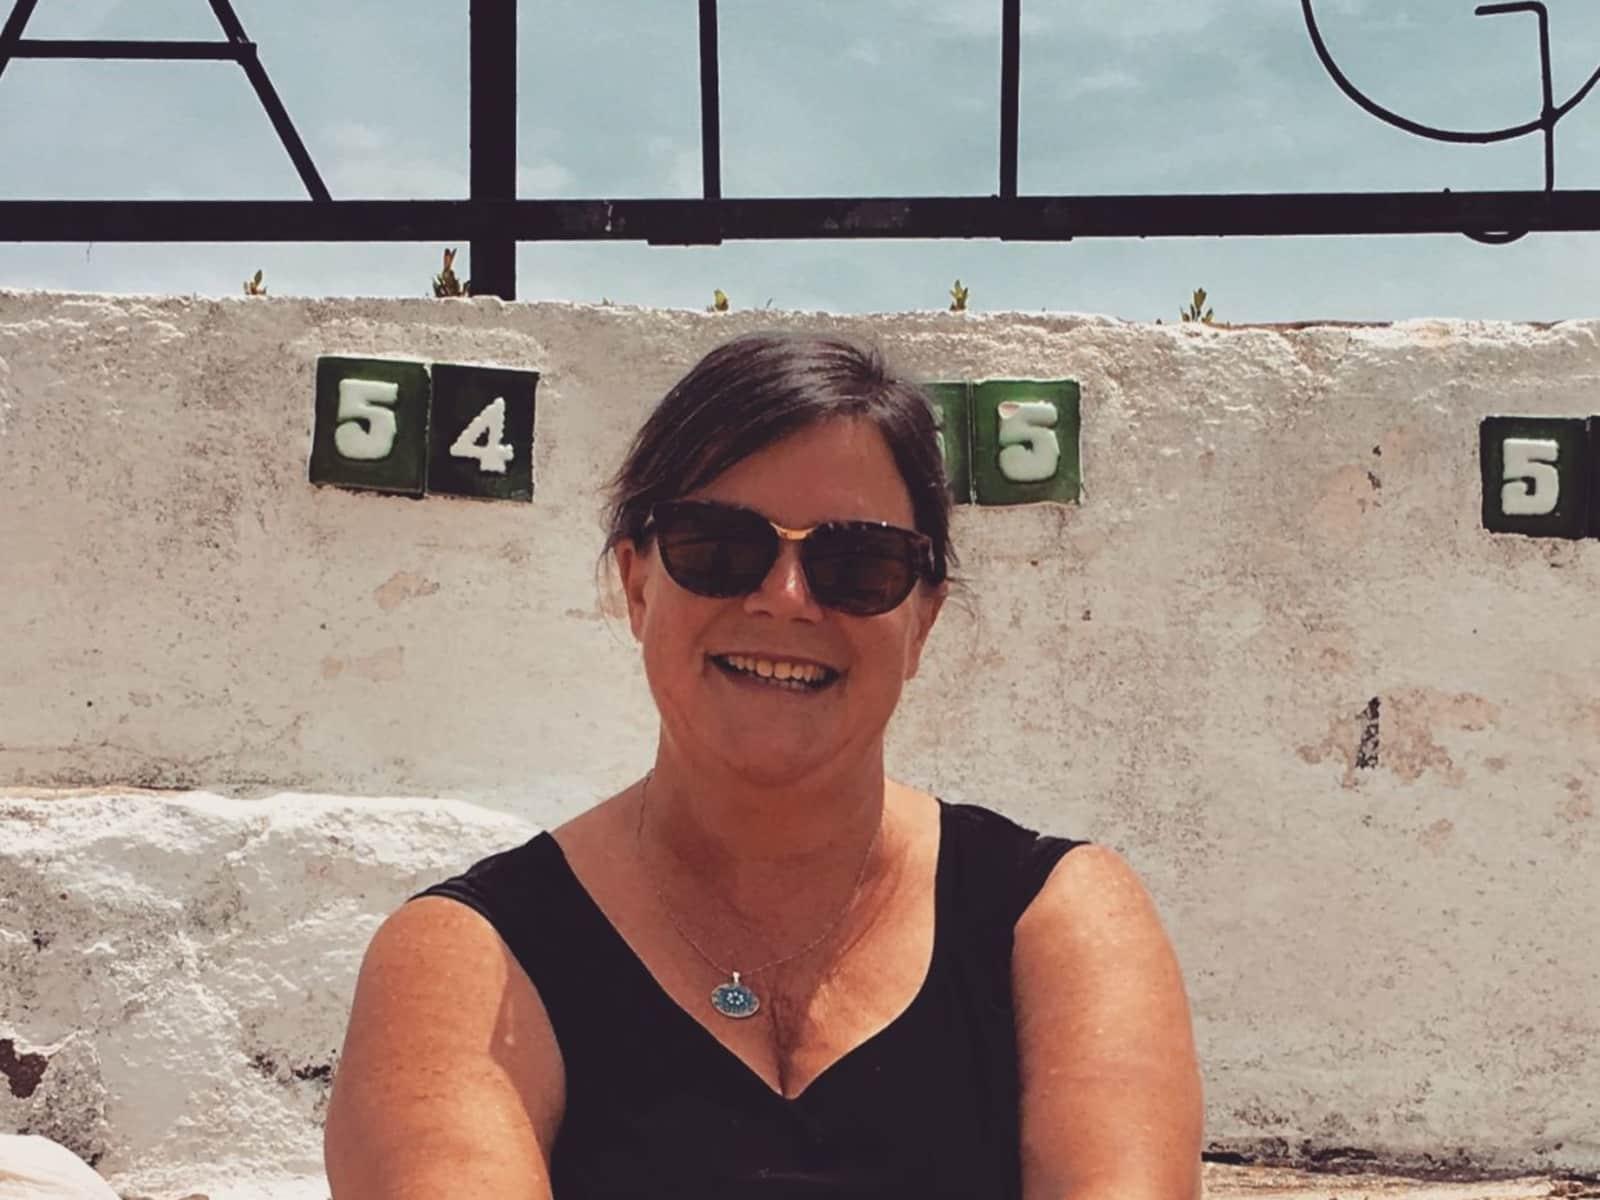 Kathy from Warrandyte, Victoria, Australia